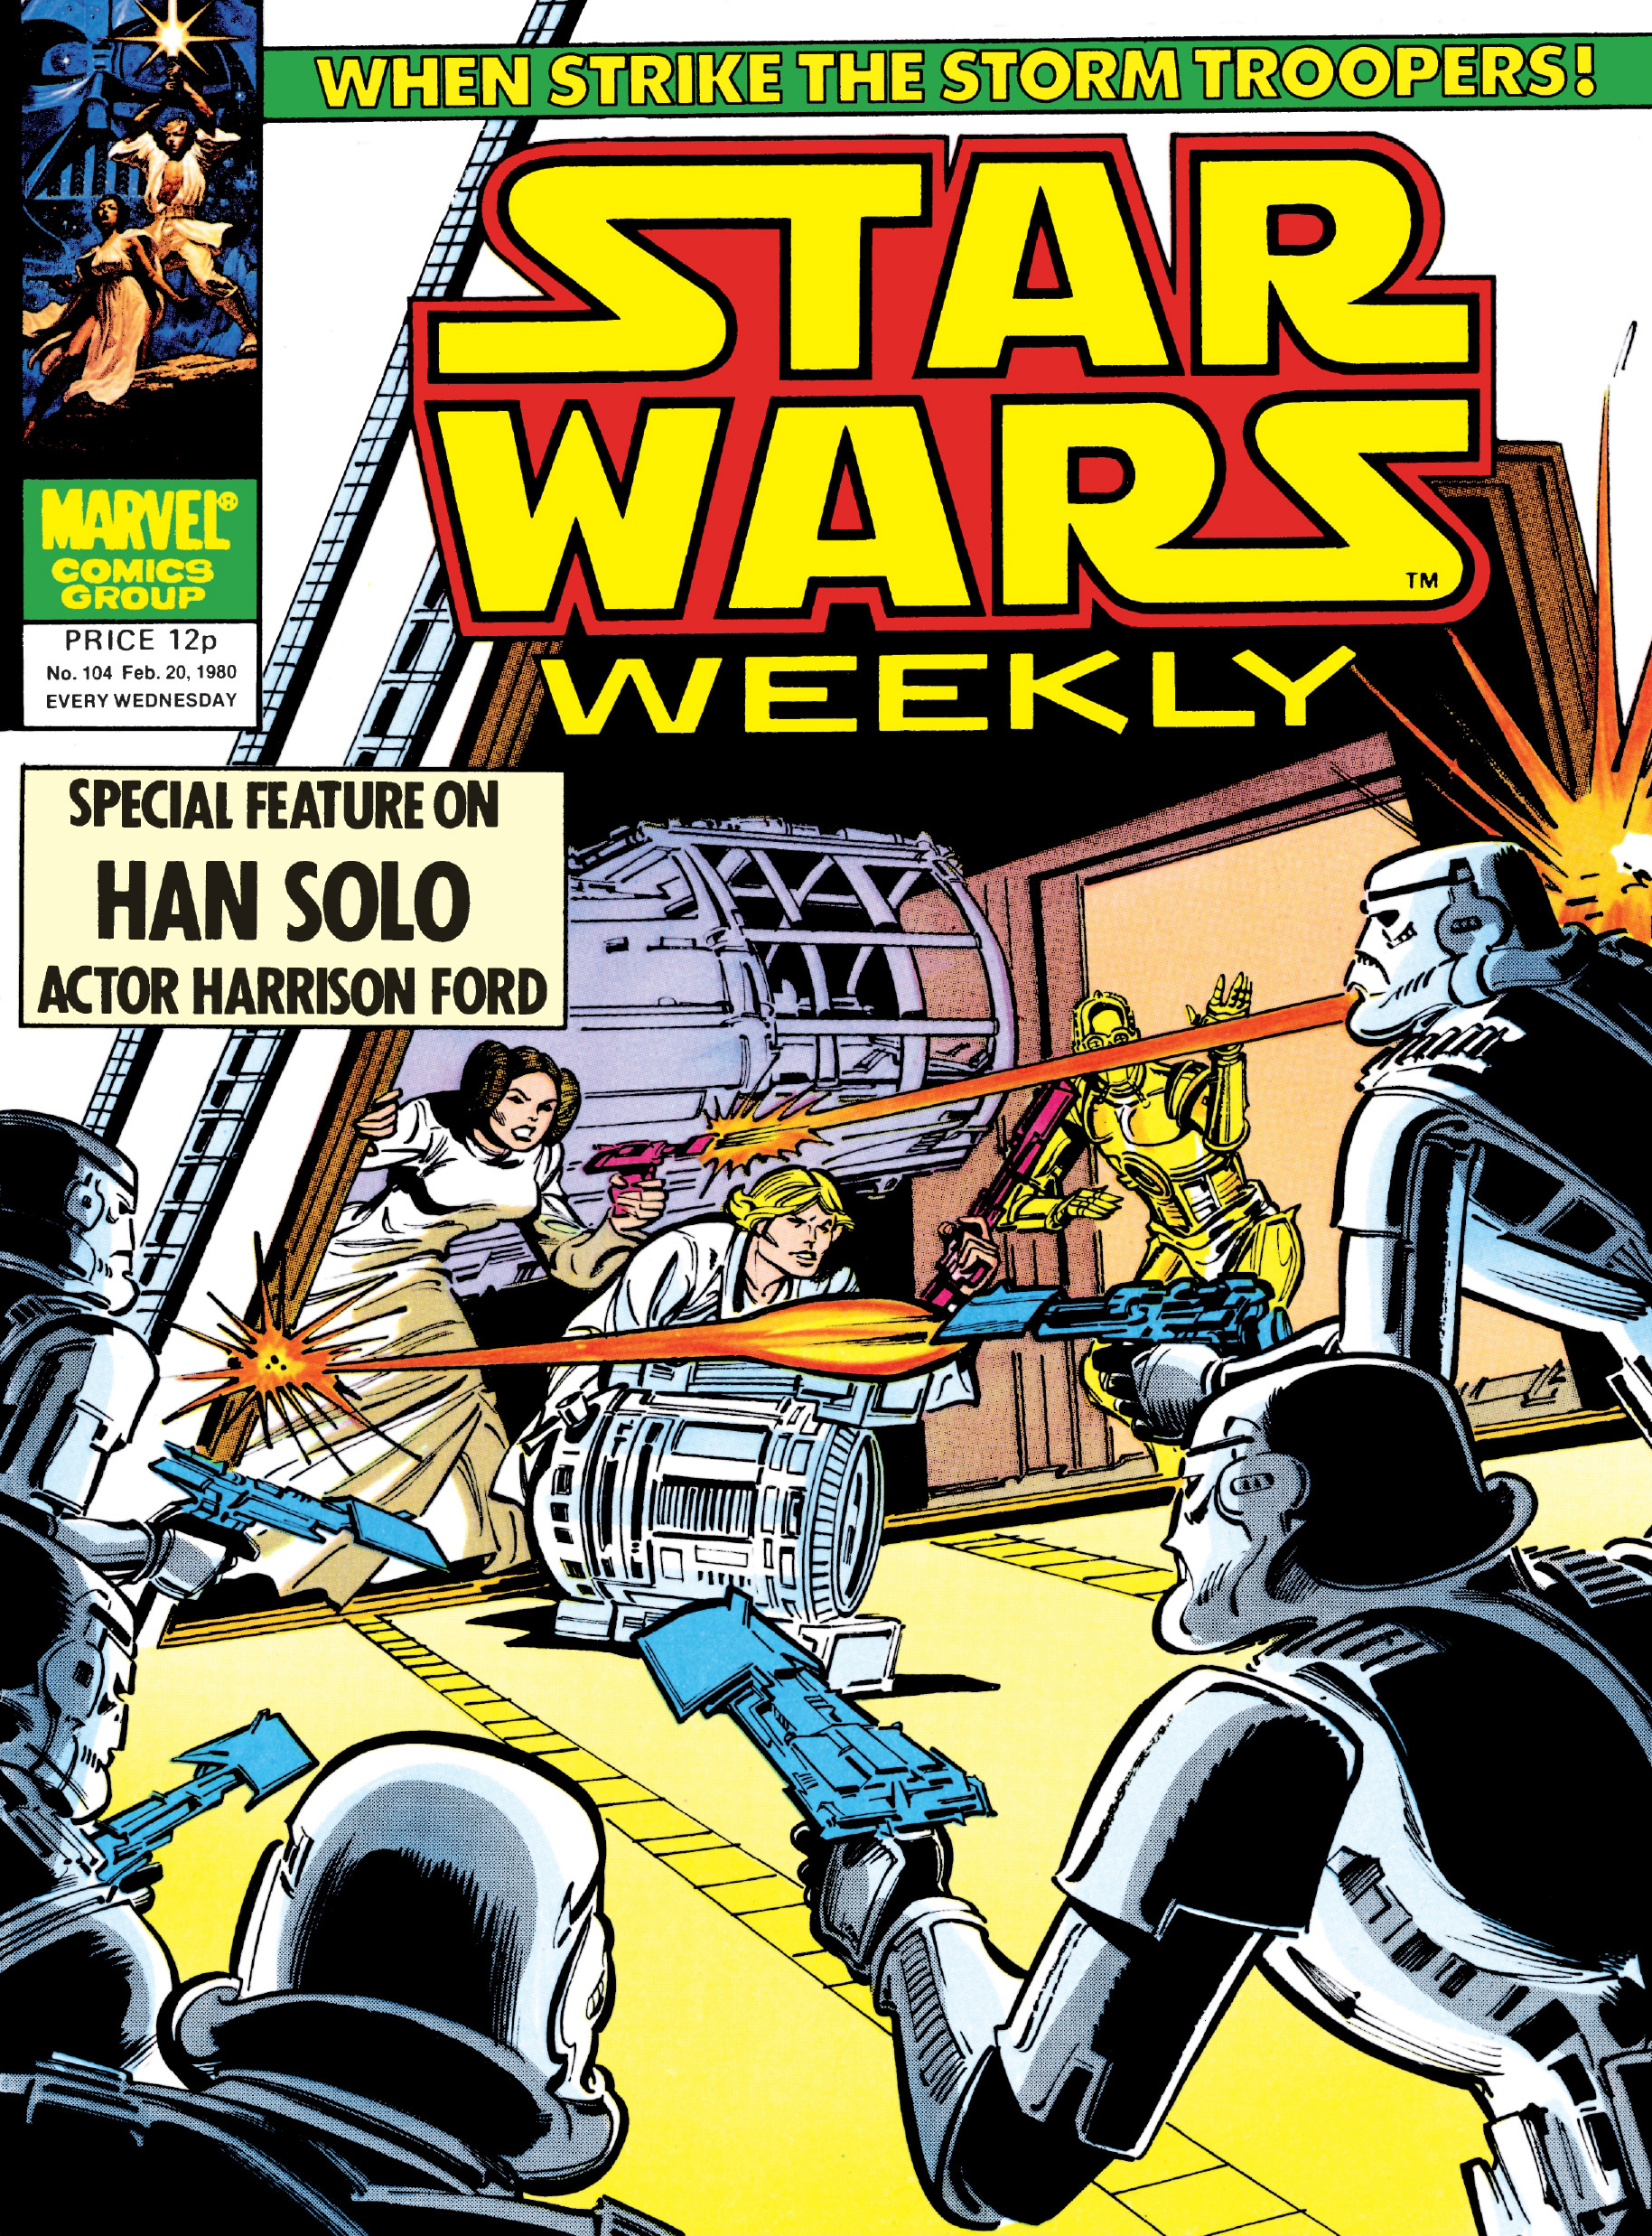 Star Wars Weekly 104